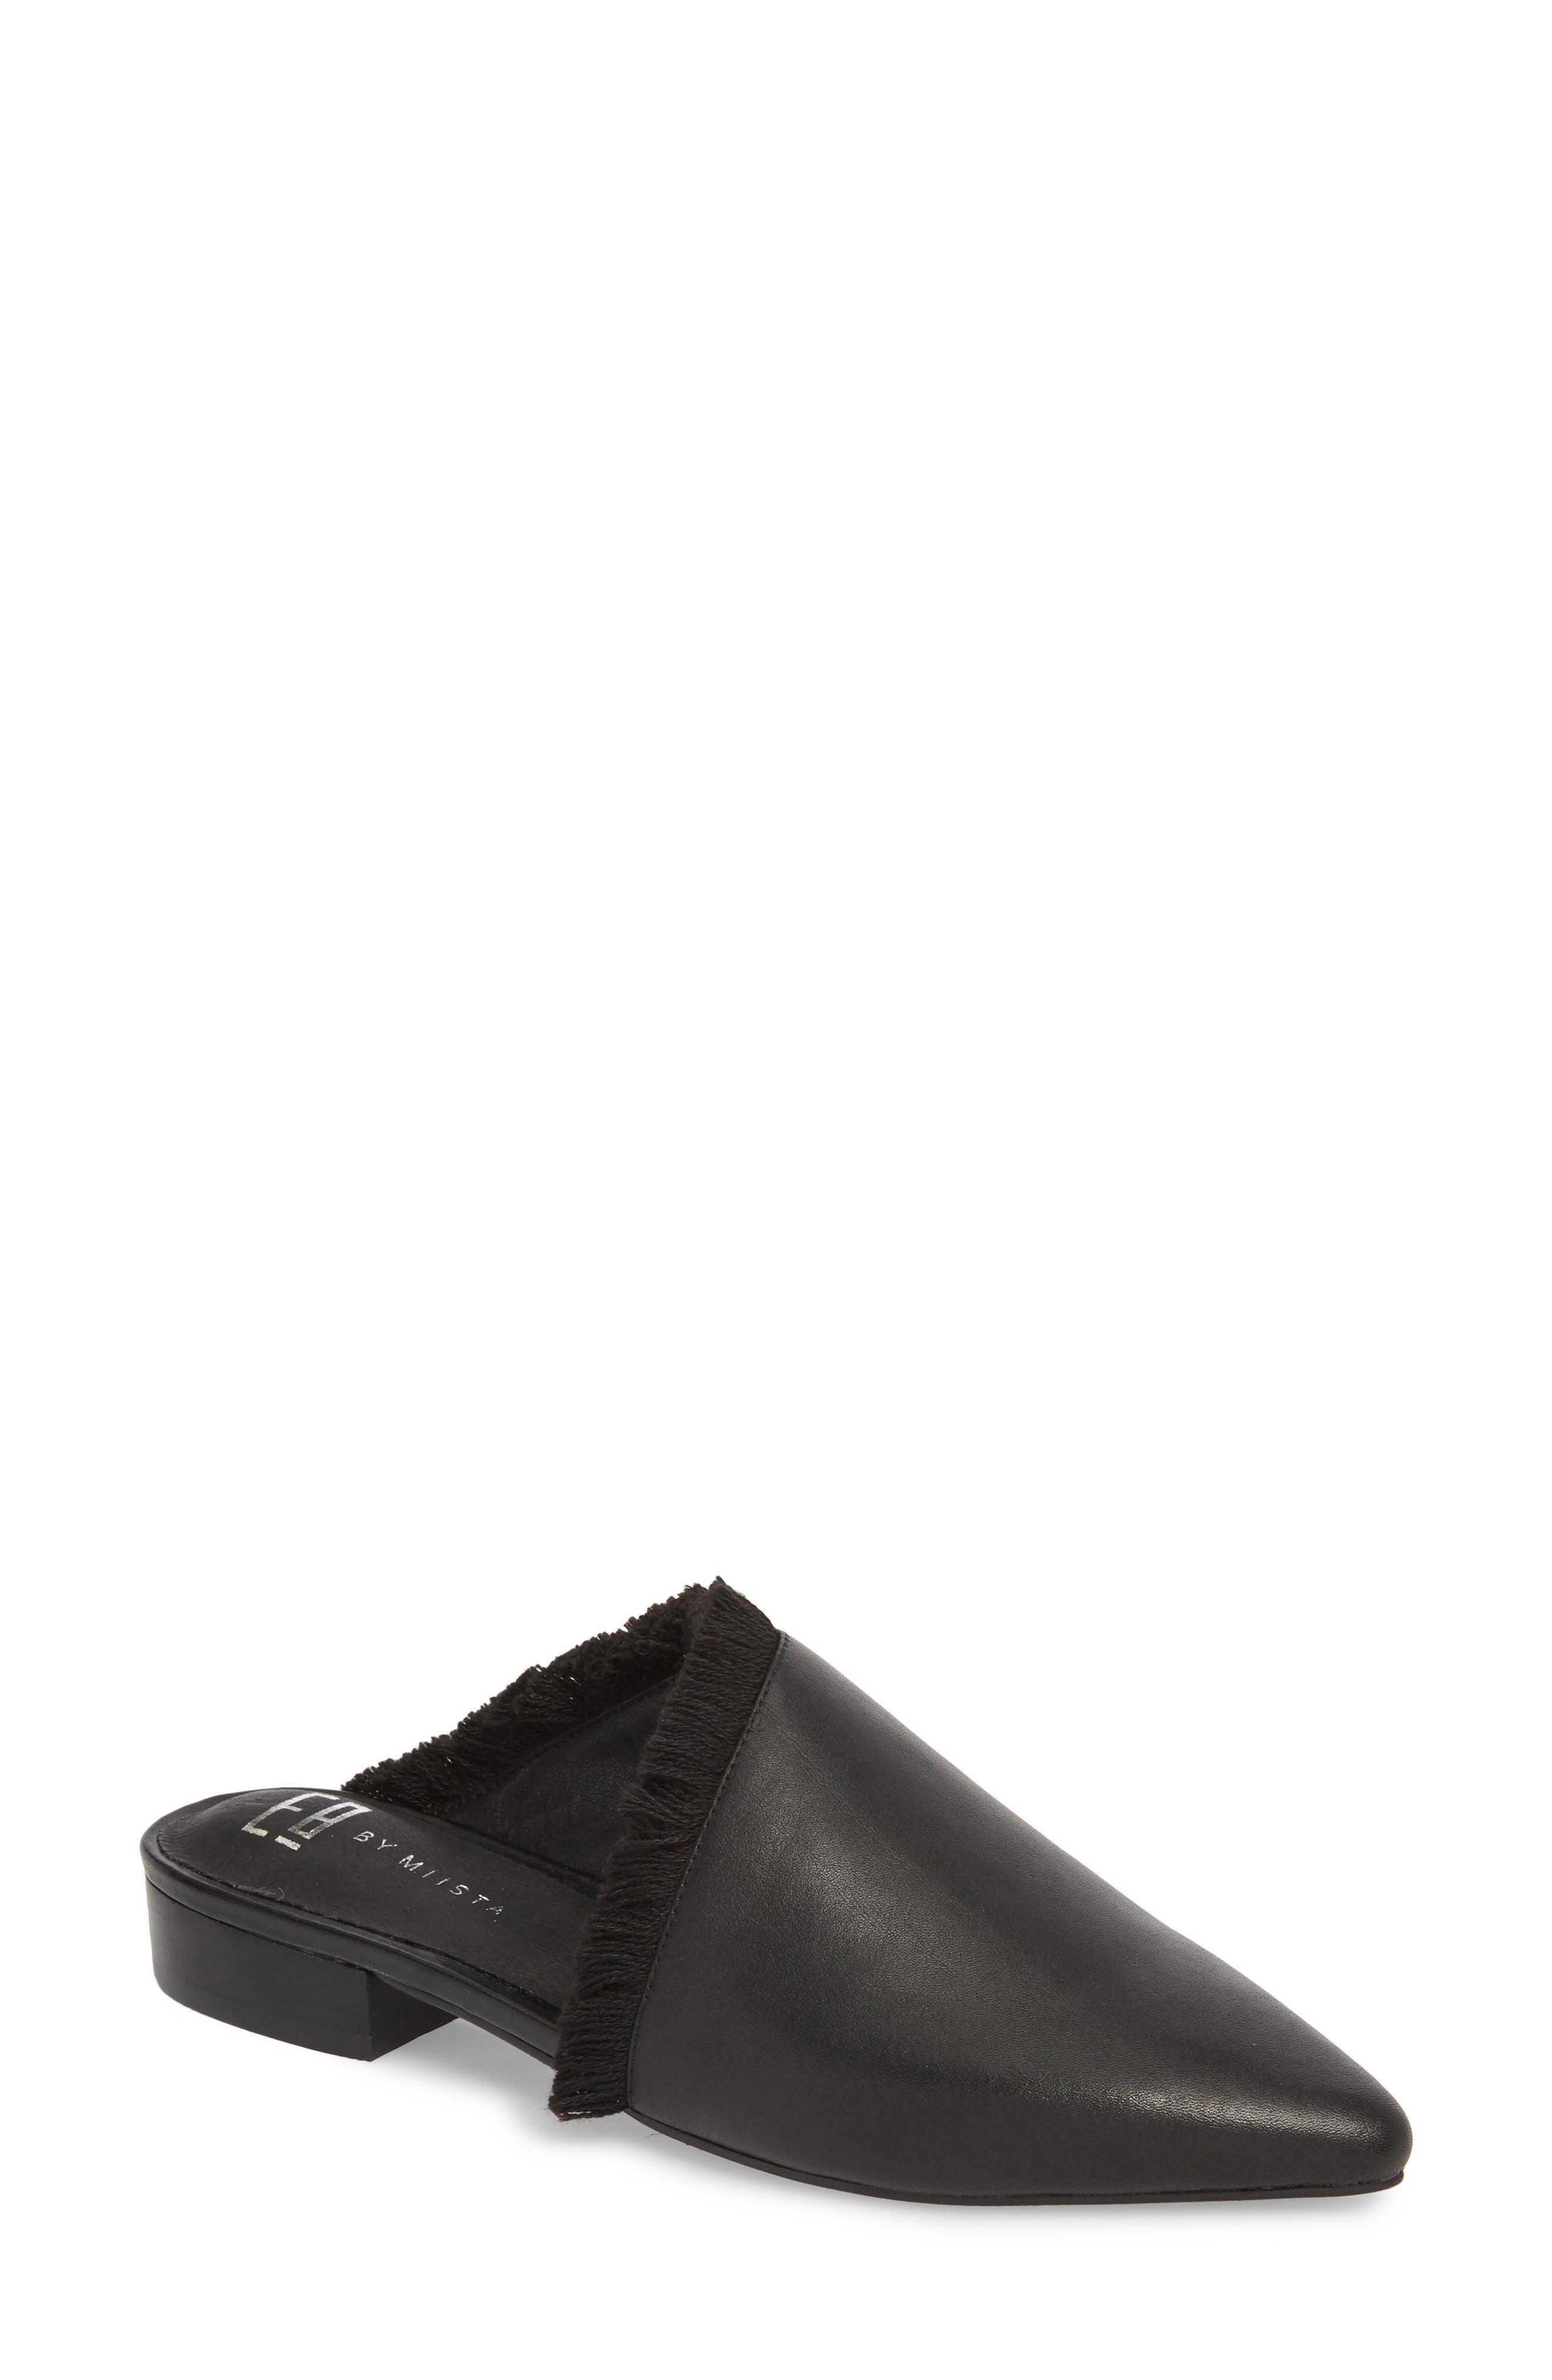 Leroy Asymmetrical Flat Mule,                         Main,                         color, Black Leather